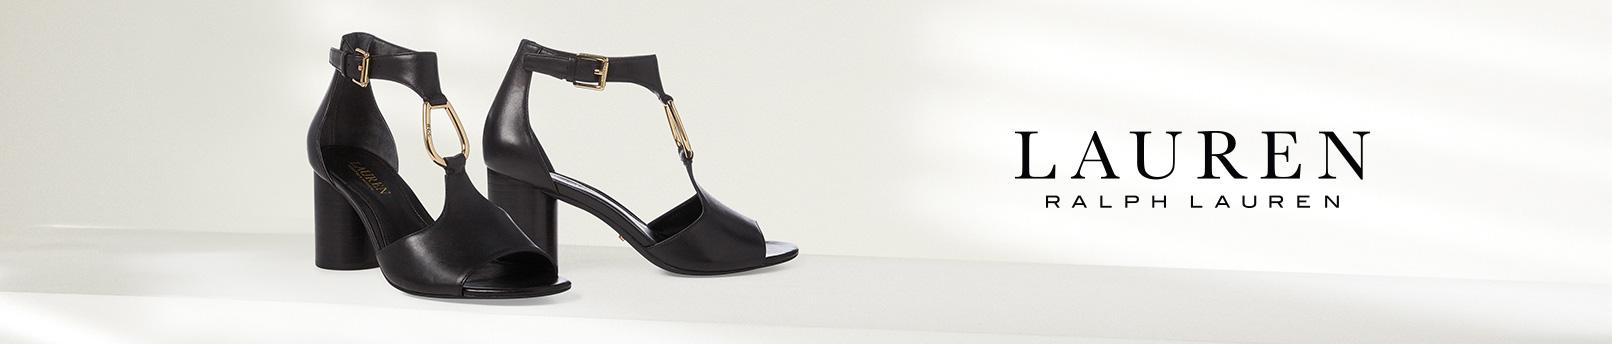 low cost 8d040 5bf05 Schuhe für Damen online shoppen   Zalando